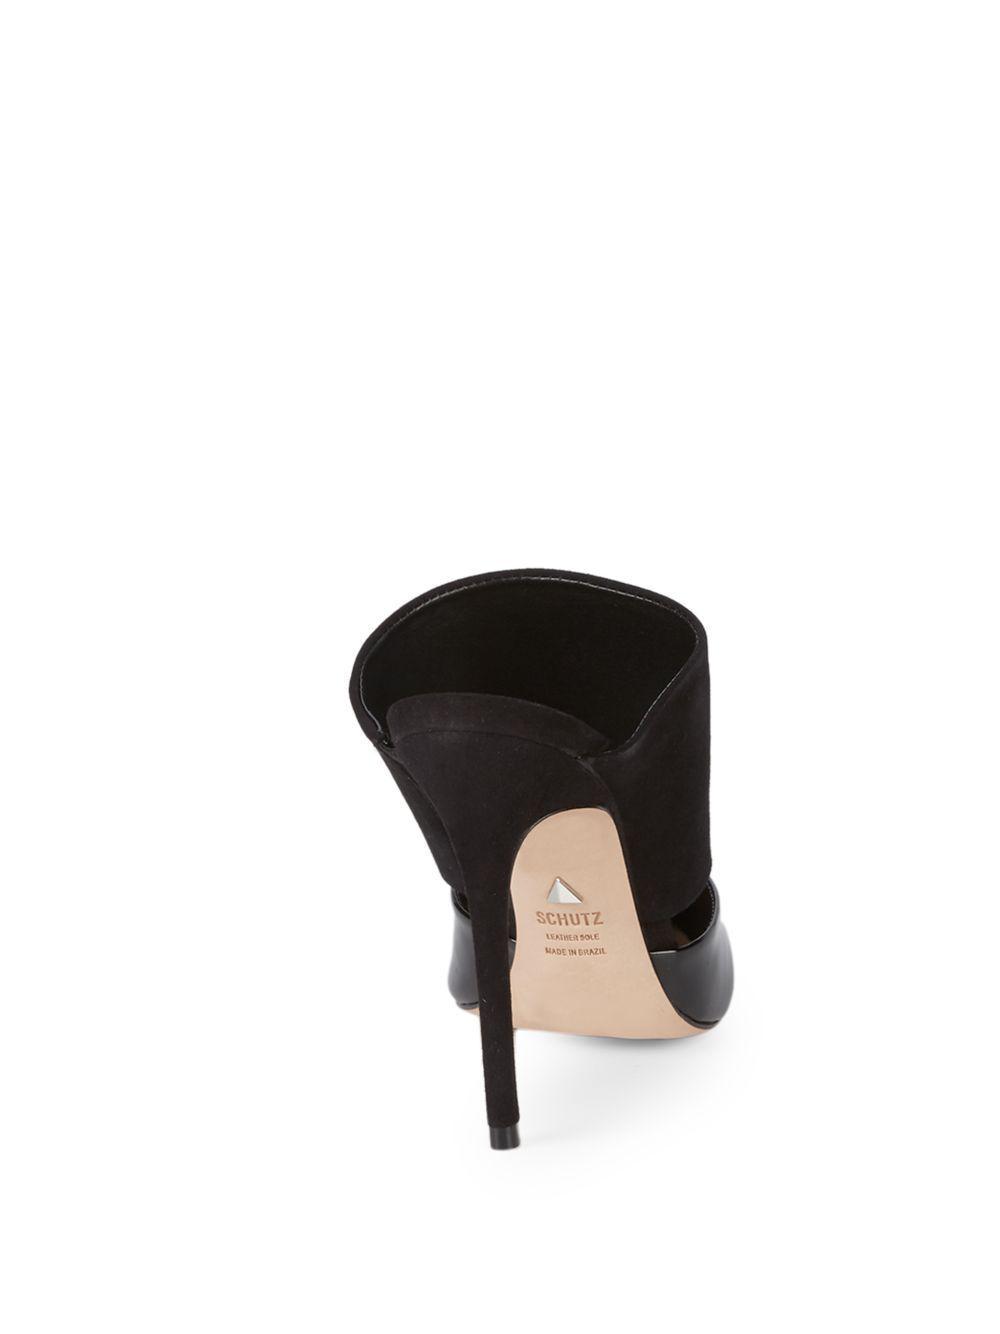 804e0aeb45022 Schutz Quereda Patent Leather & Suede Stiletto Mules in Black - Lyst